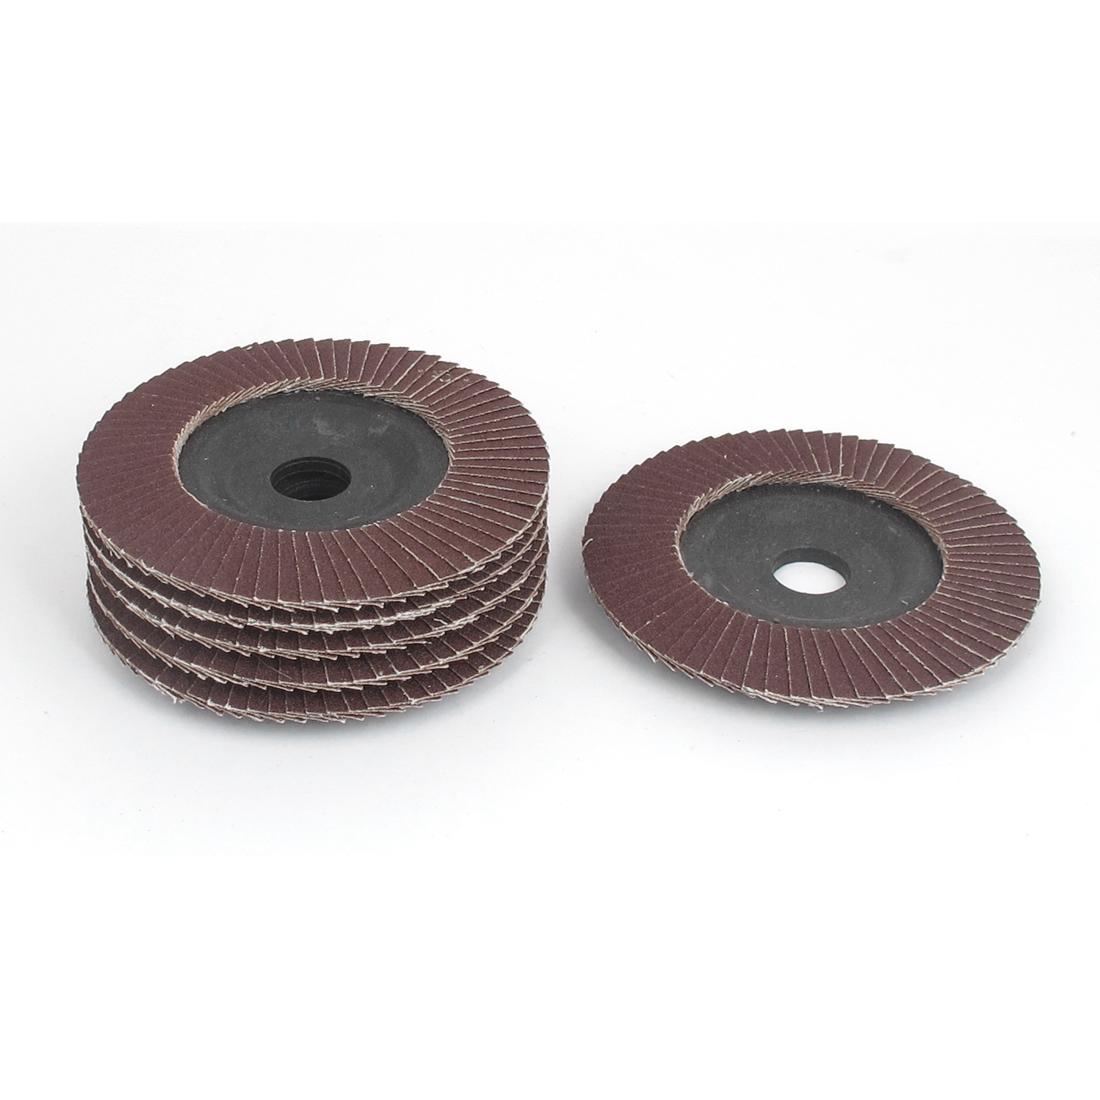 6 Pcs 100mm Dia Sanding Flap Disc Grinding Wheel 120 Grit for Angle Grinder